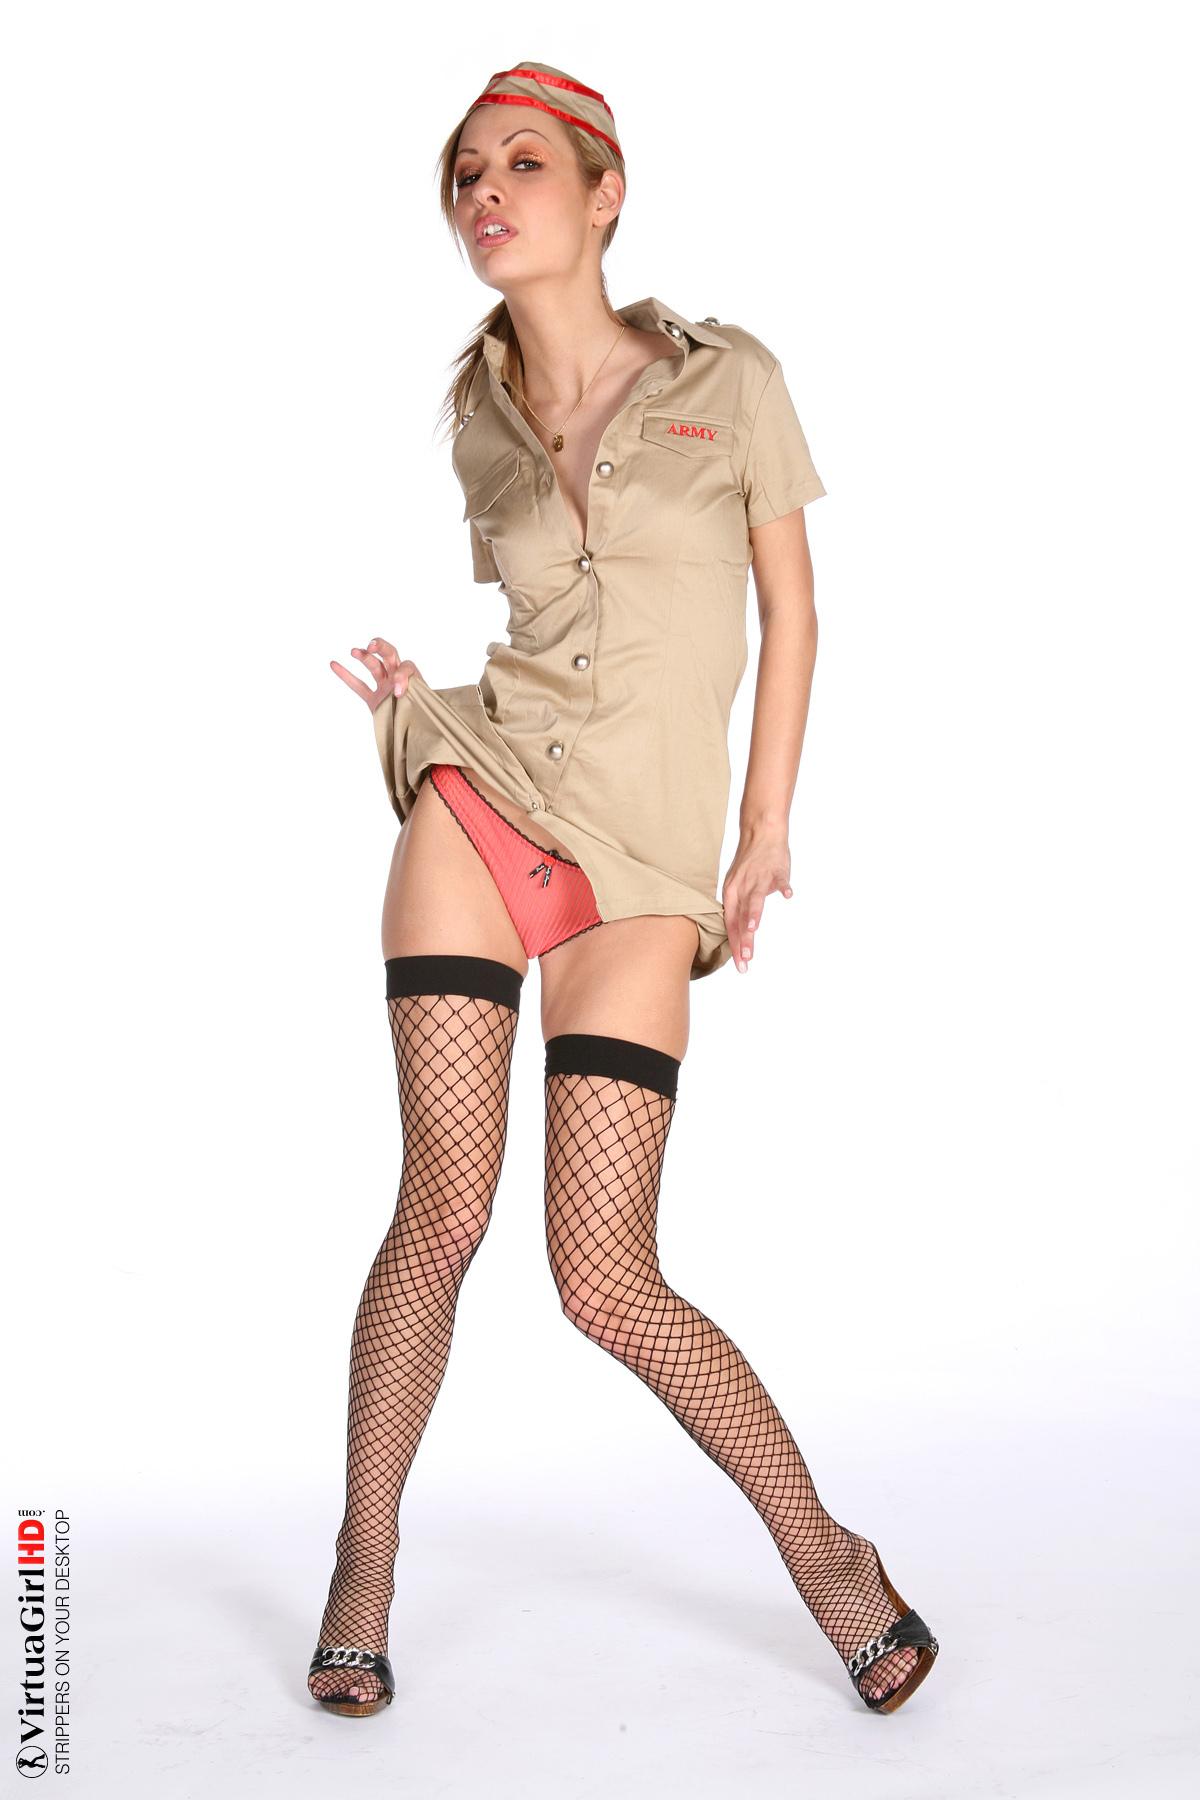 movie woman stripping a man pleasure girls